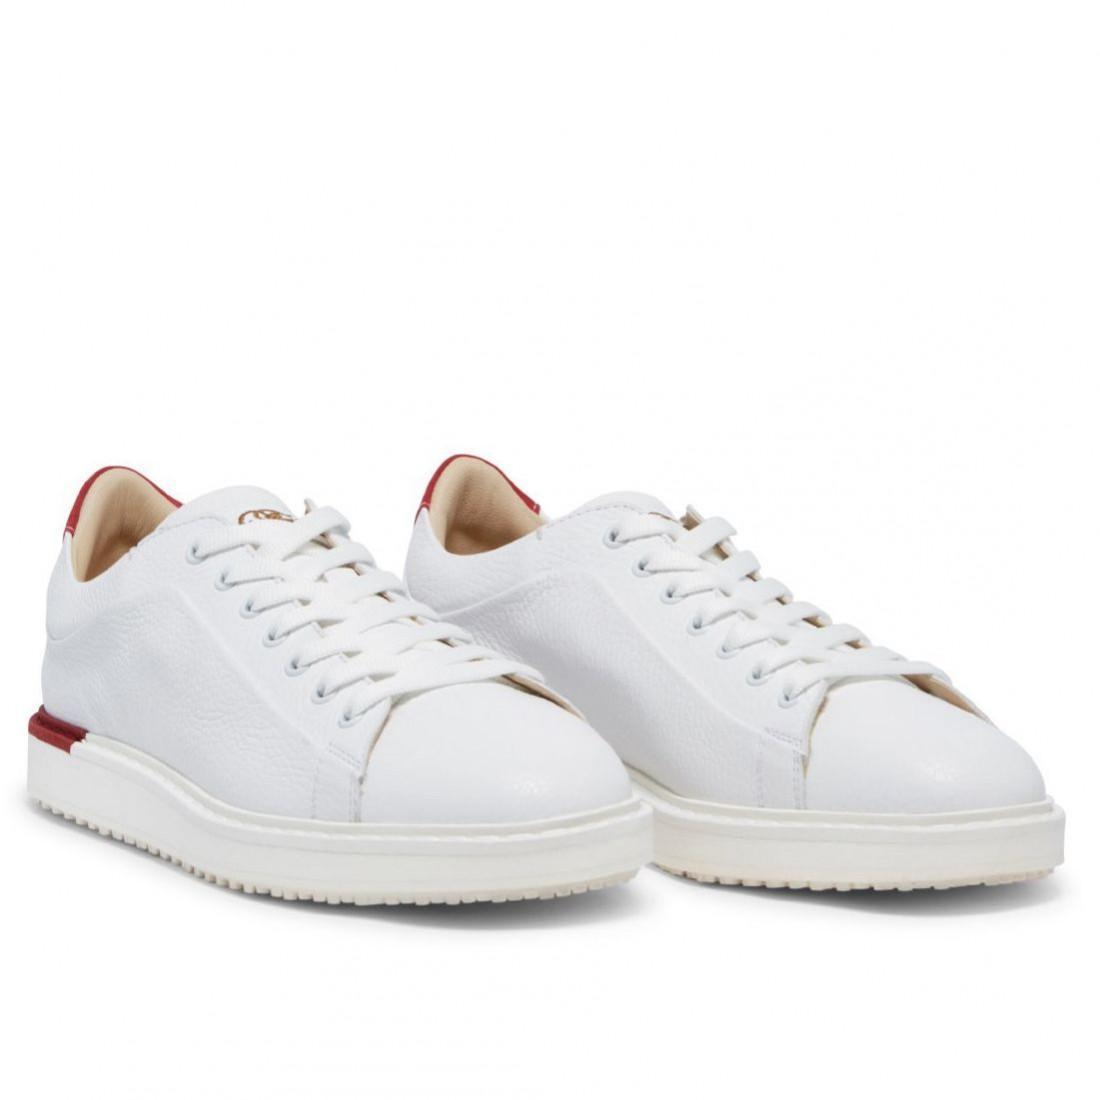 sneakers herren fabi fu9325b04wimacxs60 6596